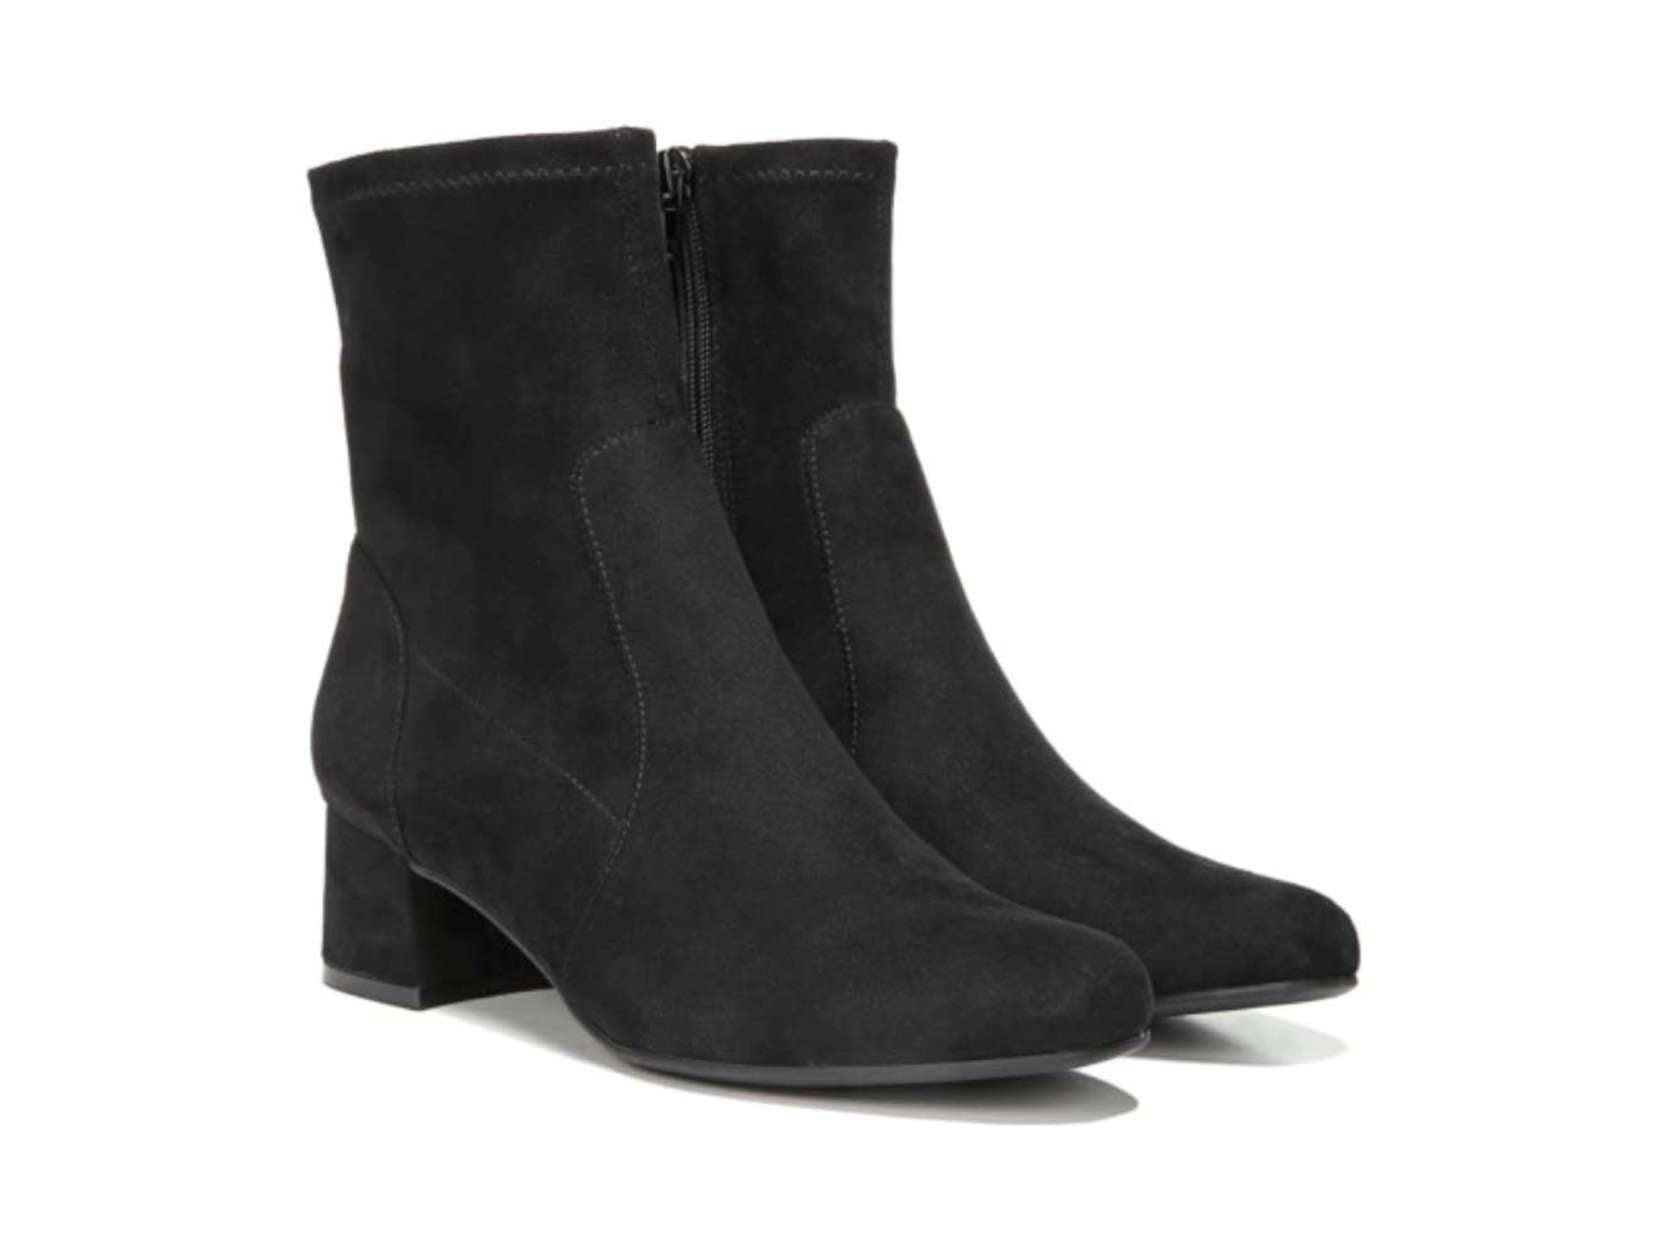 af7292ae0a naturalizer - Womens naturalizer Daley Block-Heel Ankle Boots, Black -  Walmart.com